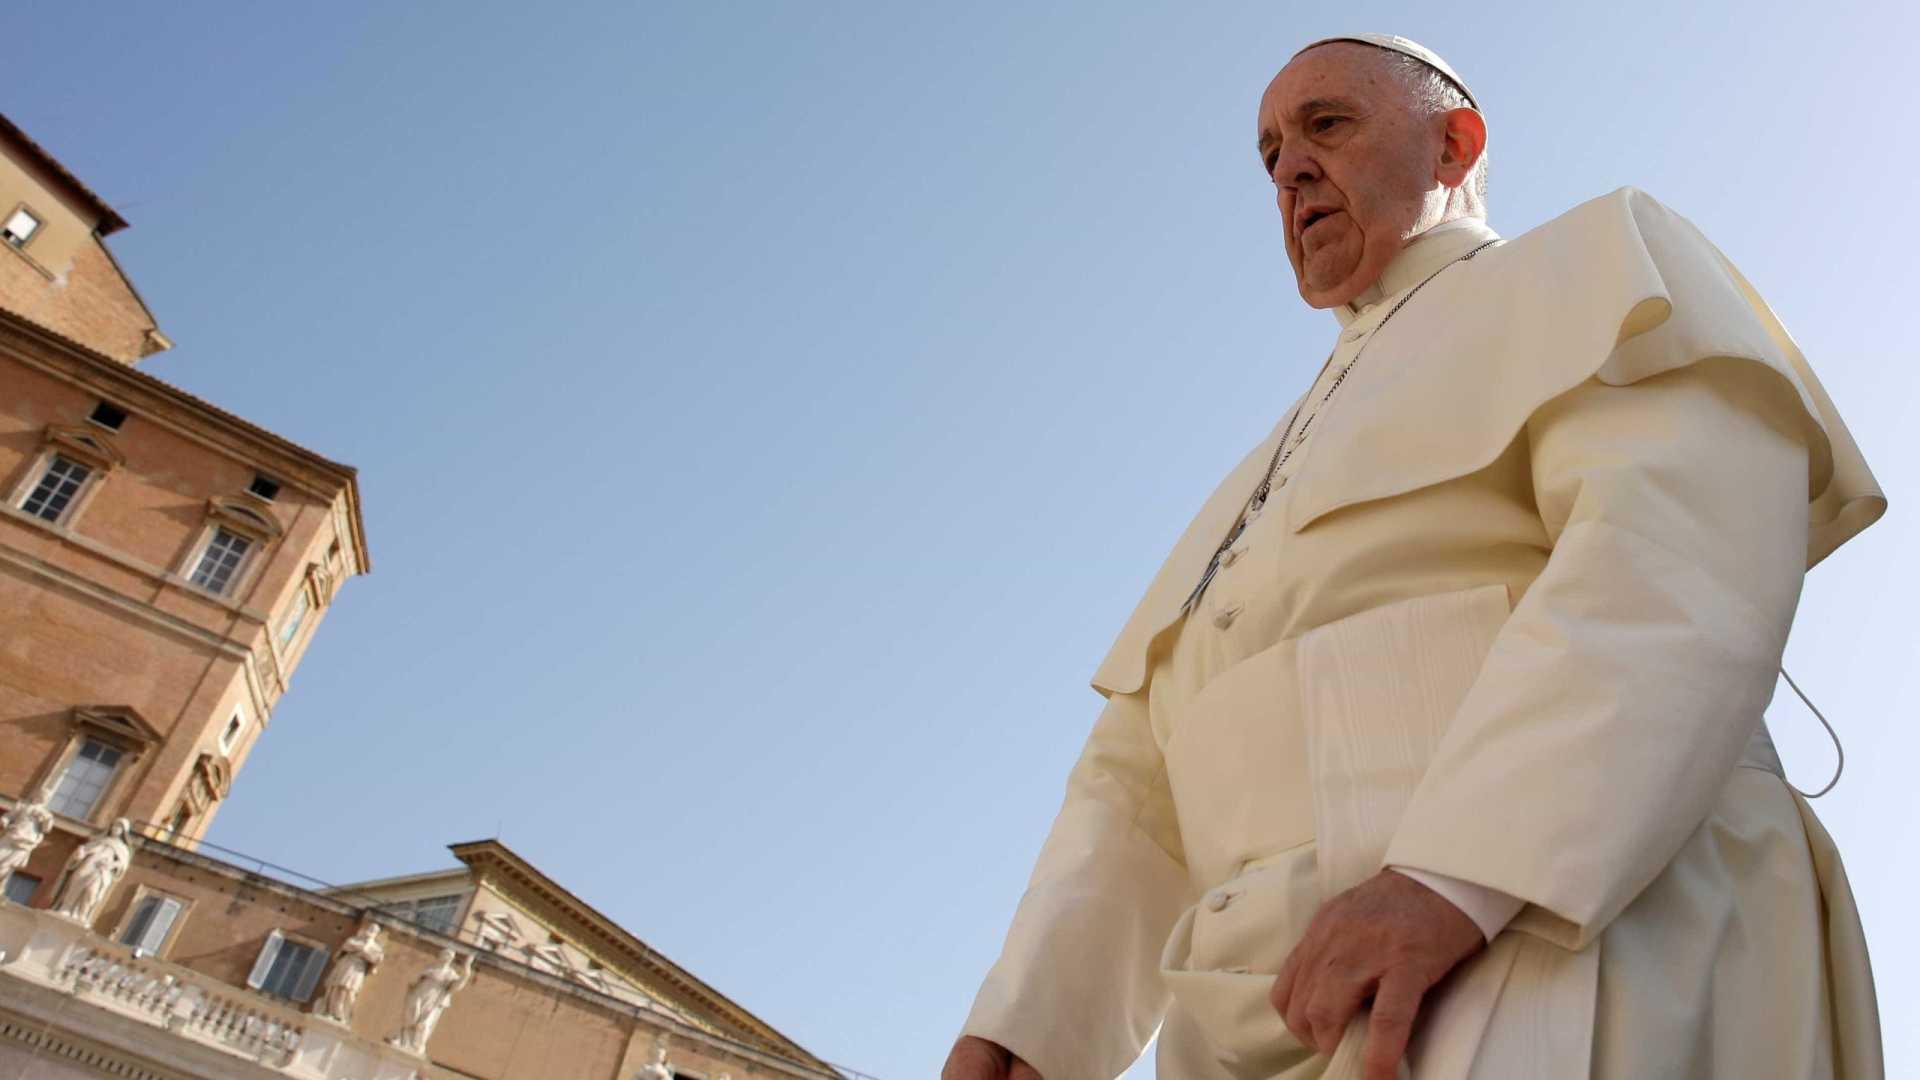 Papa alerta sobre situação na Terra Santa: 'guerra chama guerra'